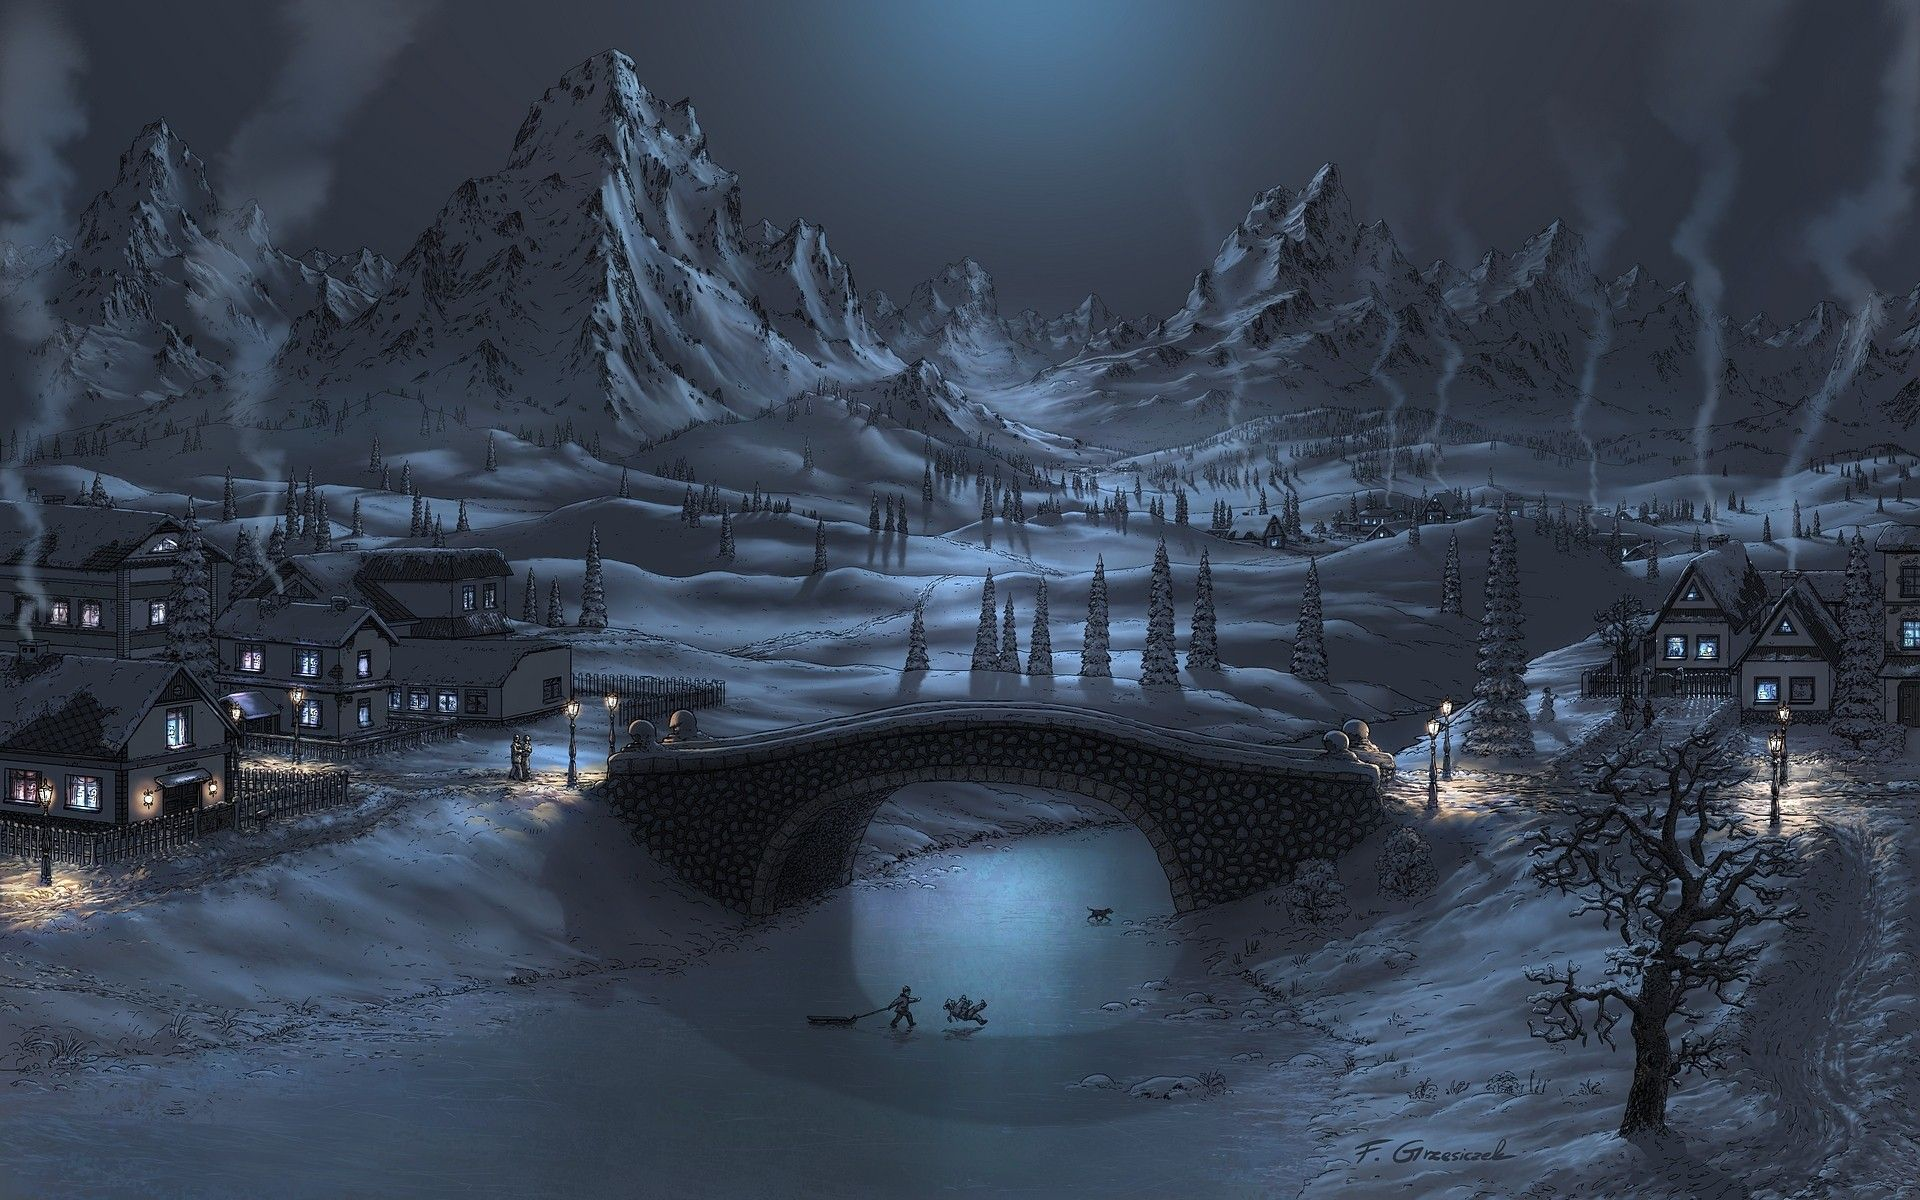 Snow Night Wallpapers Desktop Background Jllsly Winter Wallpaper Hd Winter Landscape Winter Wallpaper